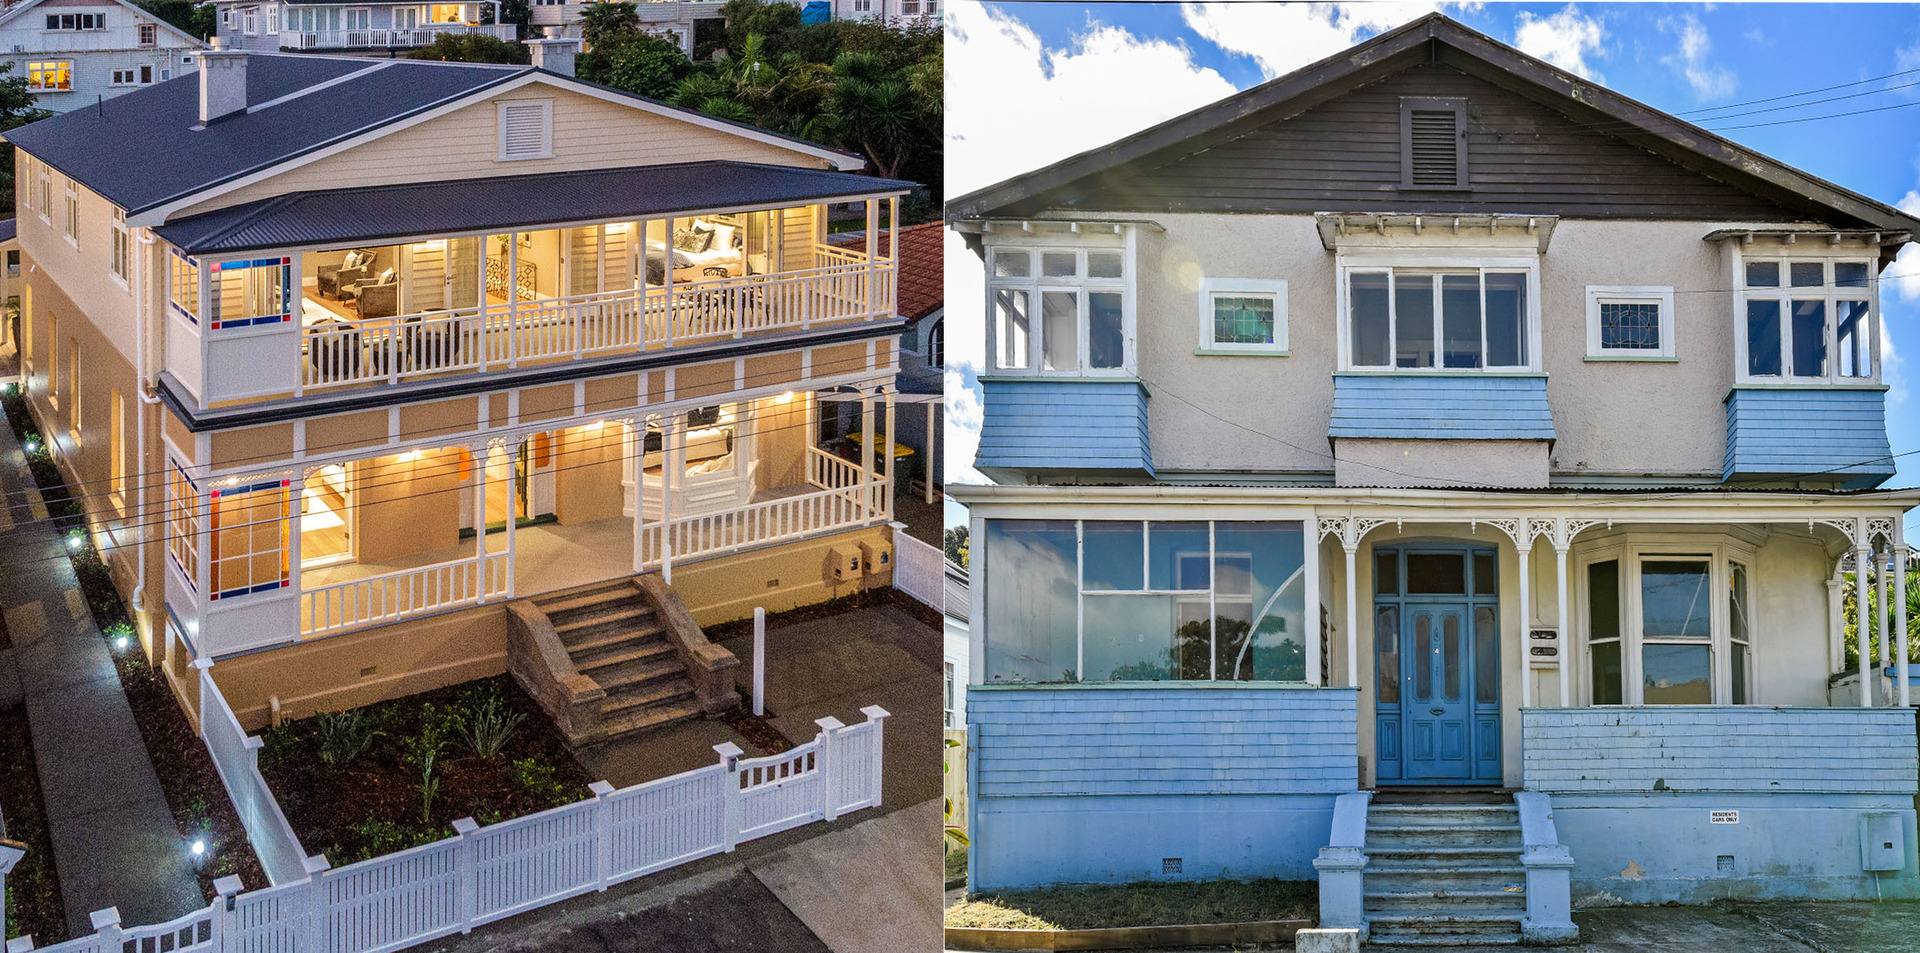 Derelict boarding house transformed to multimillion-dollar luxury